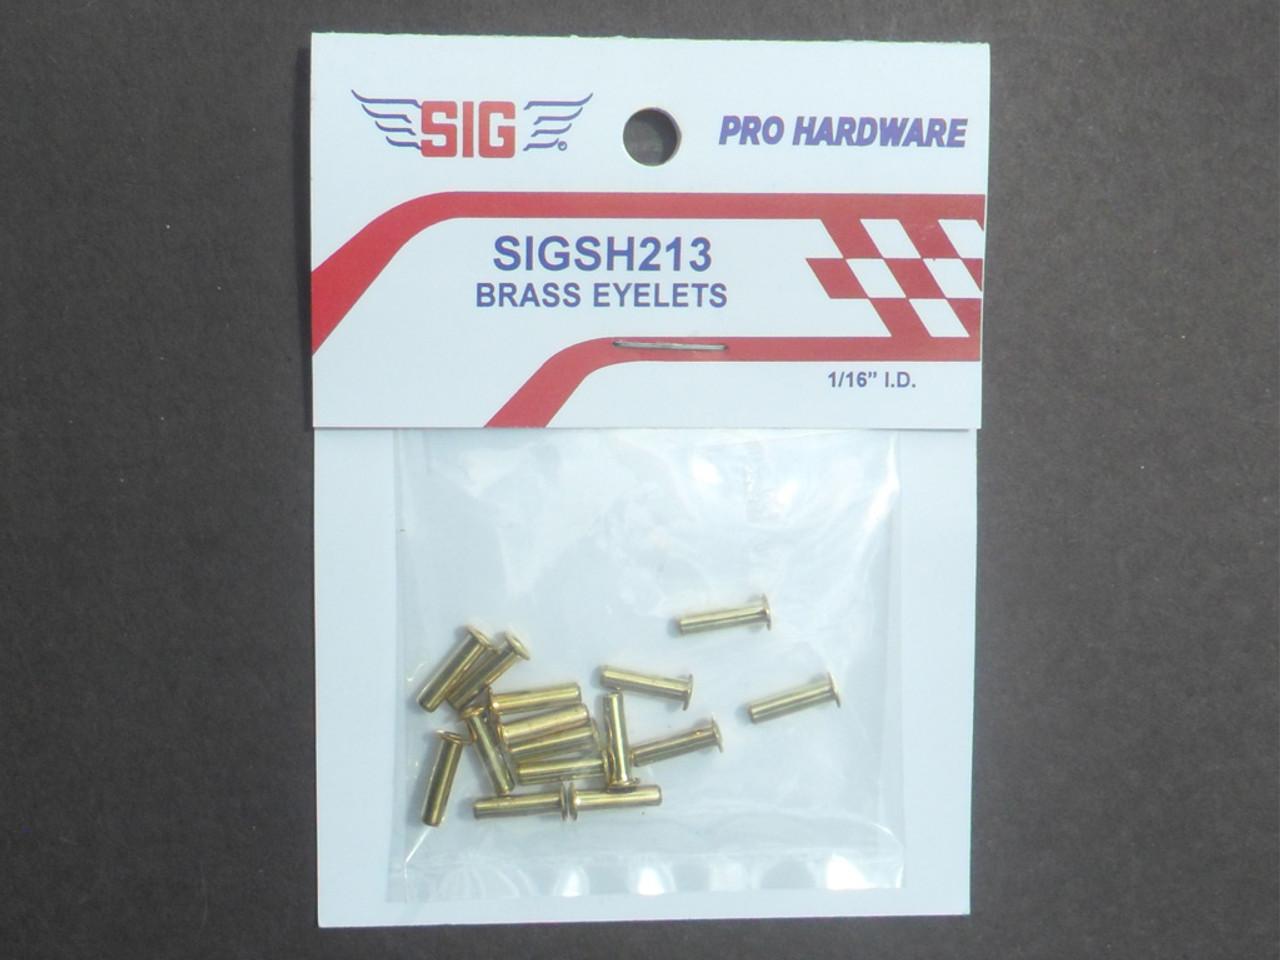 Brass Eyelets  - 1/16 I.D. - (SH-213)